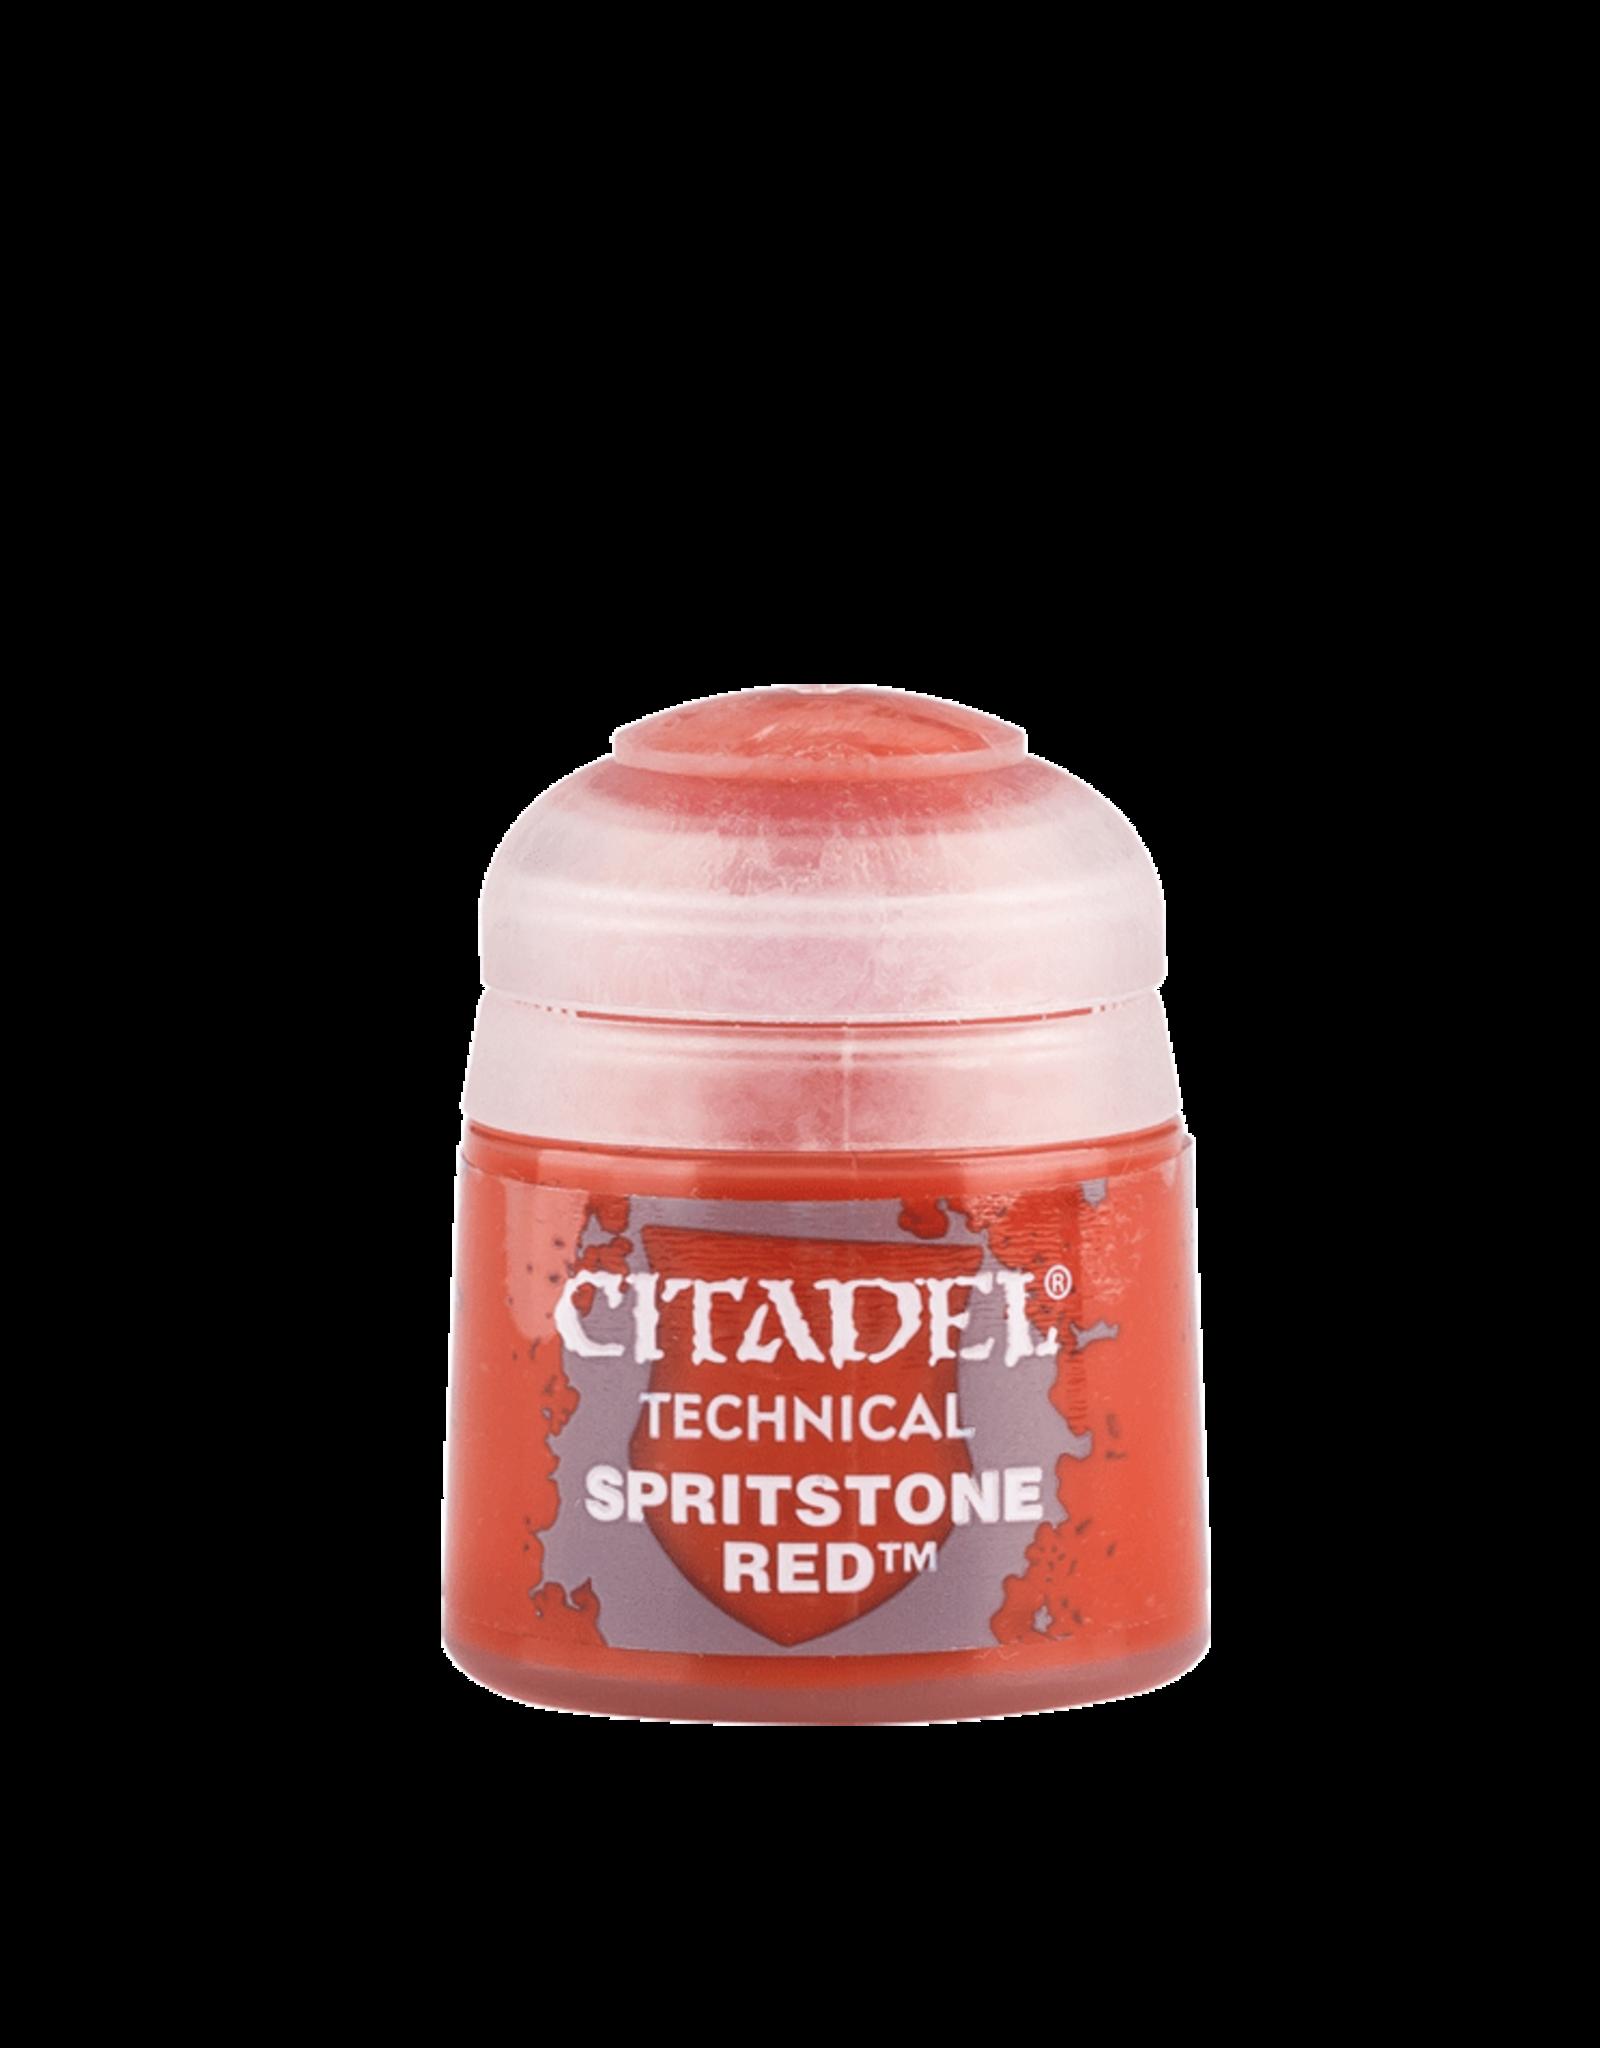 Games Workshop Citadel Paint: Technical - Spiritstone Red (12 ml)